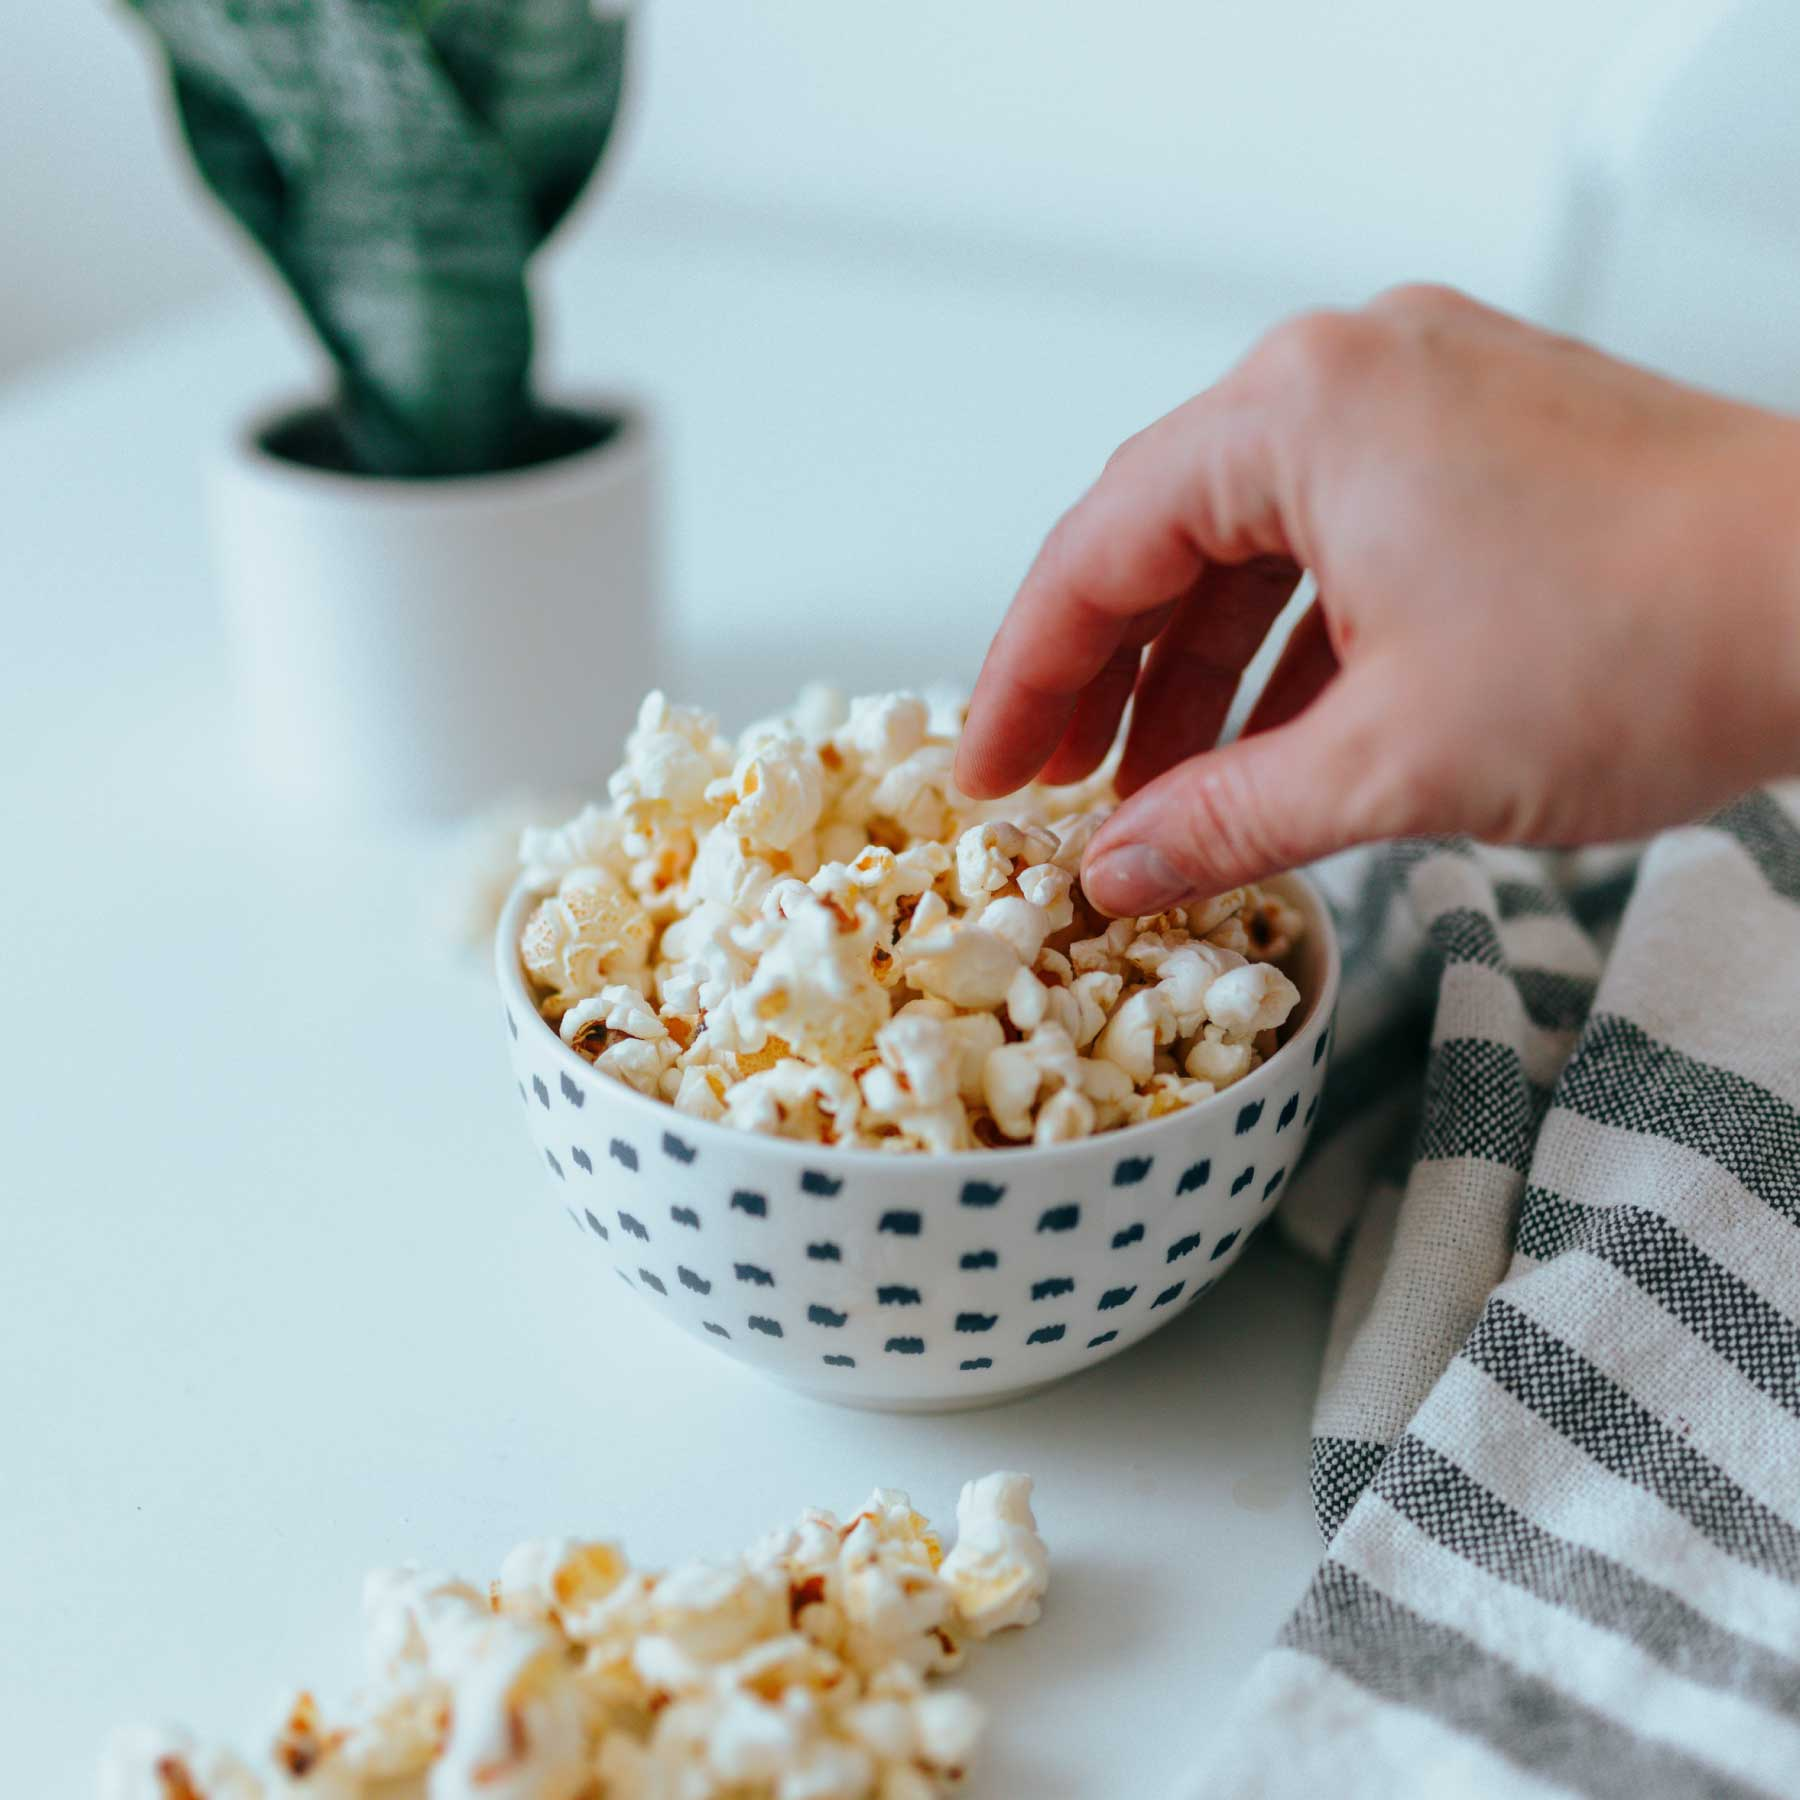 The Best Popcorn Maker for Netflix Marathons